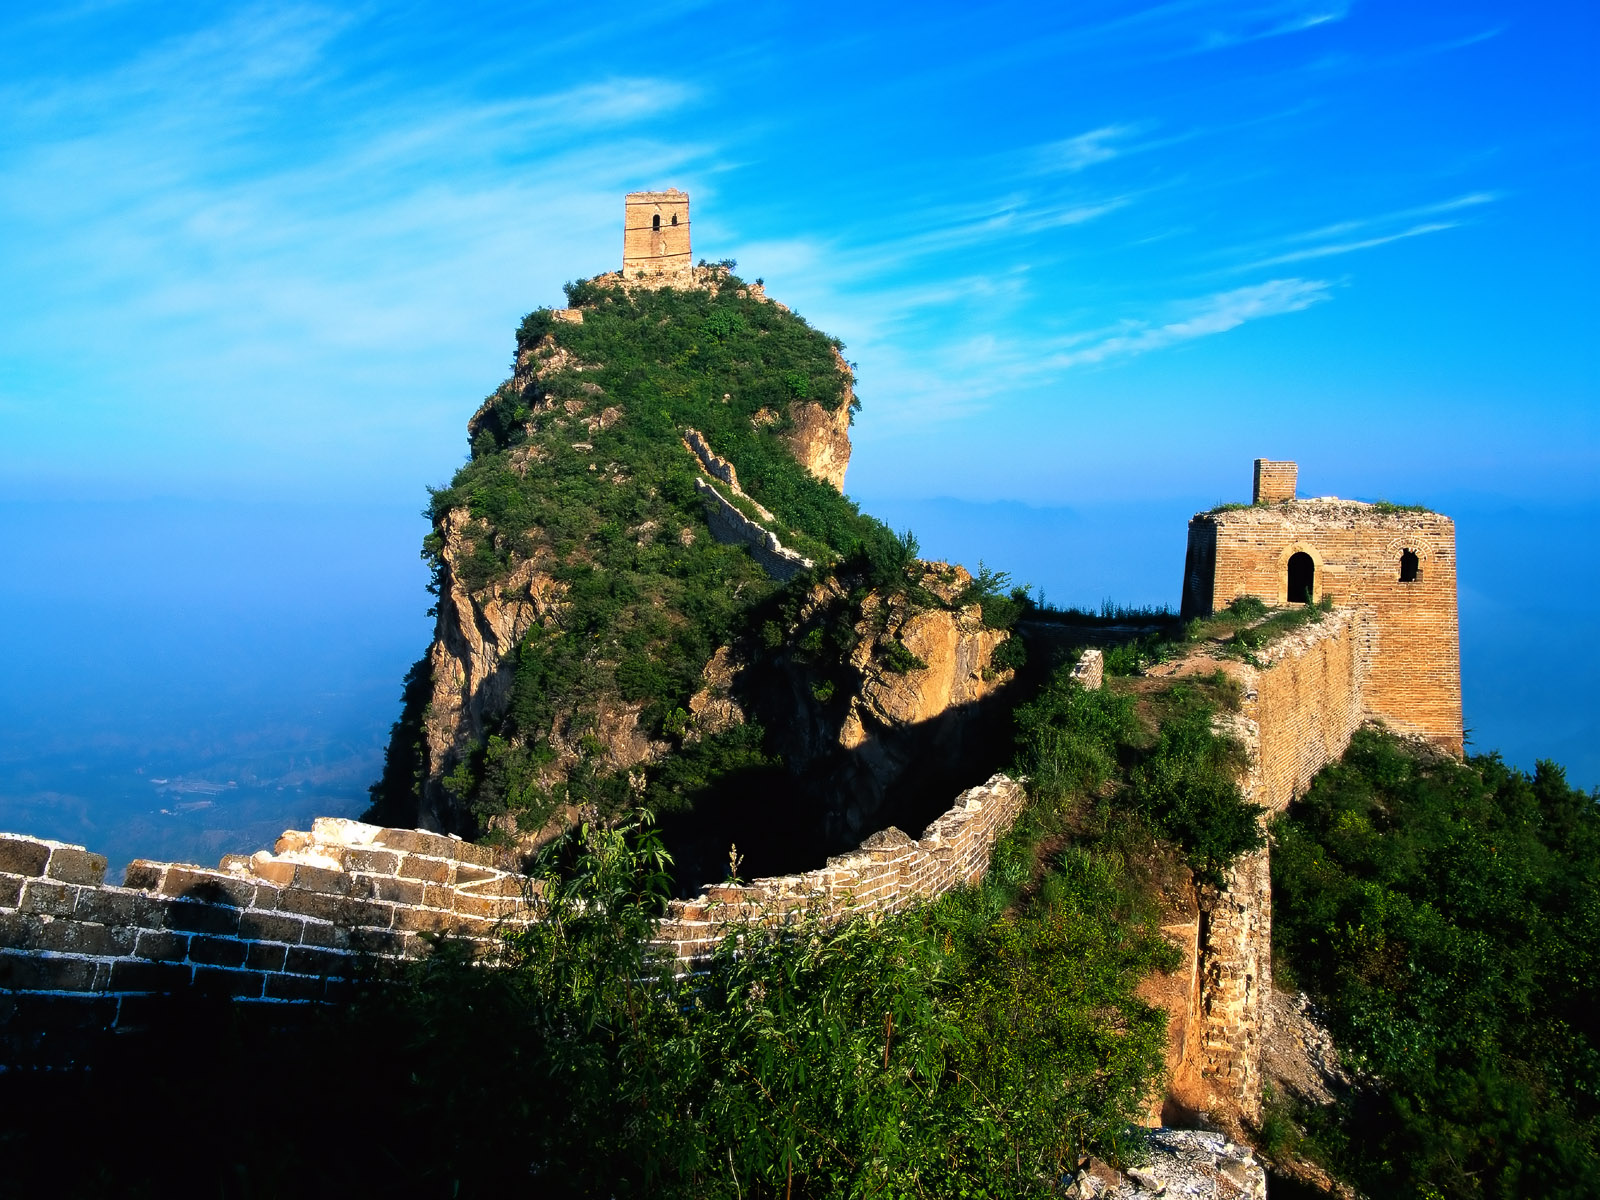 Great Wall 3   China Photography Desktop Wallpapers 9838 Views 1600x1200